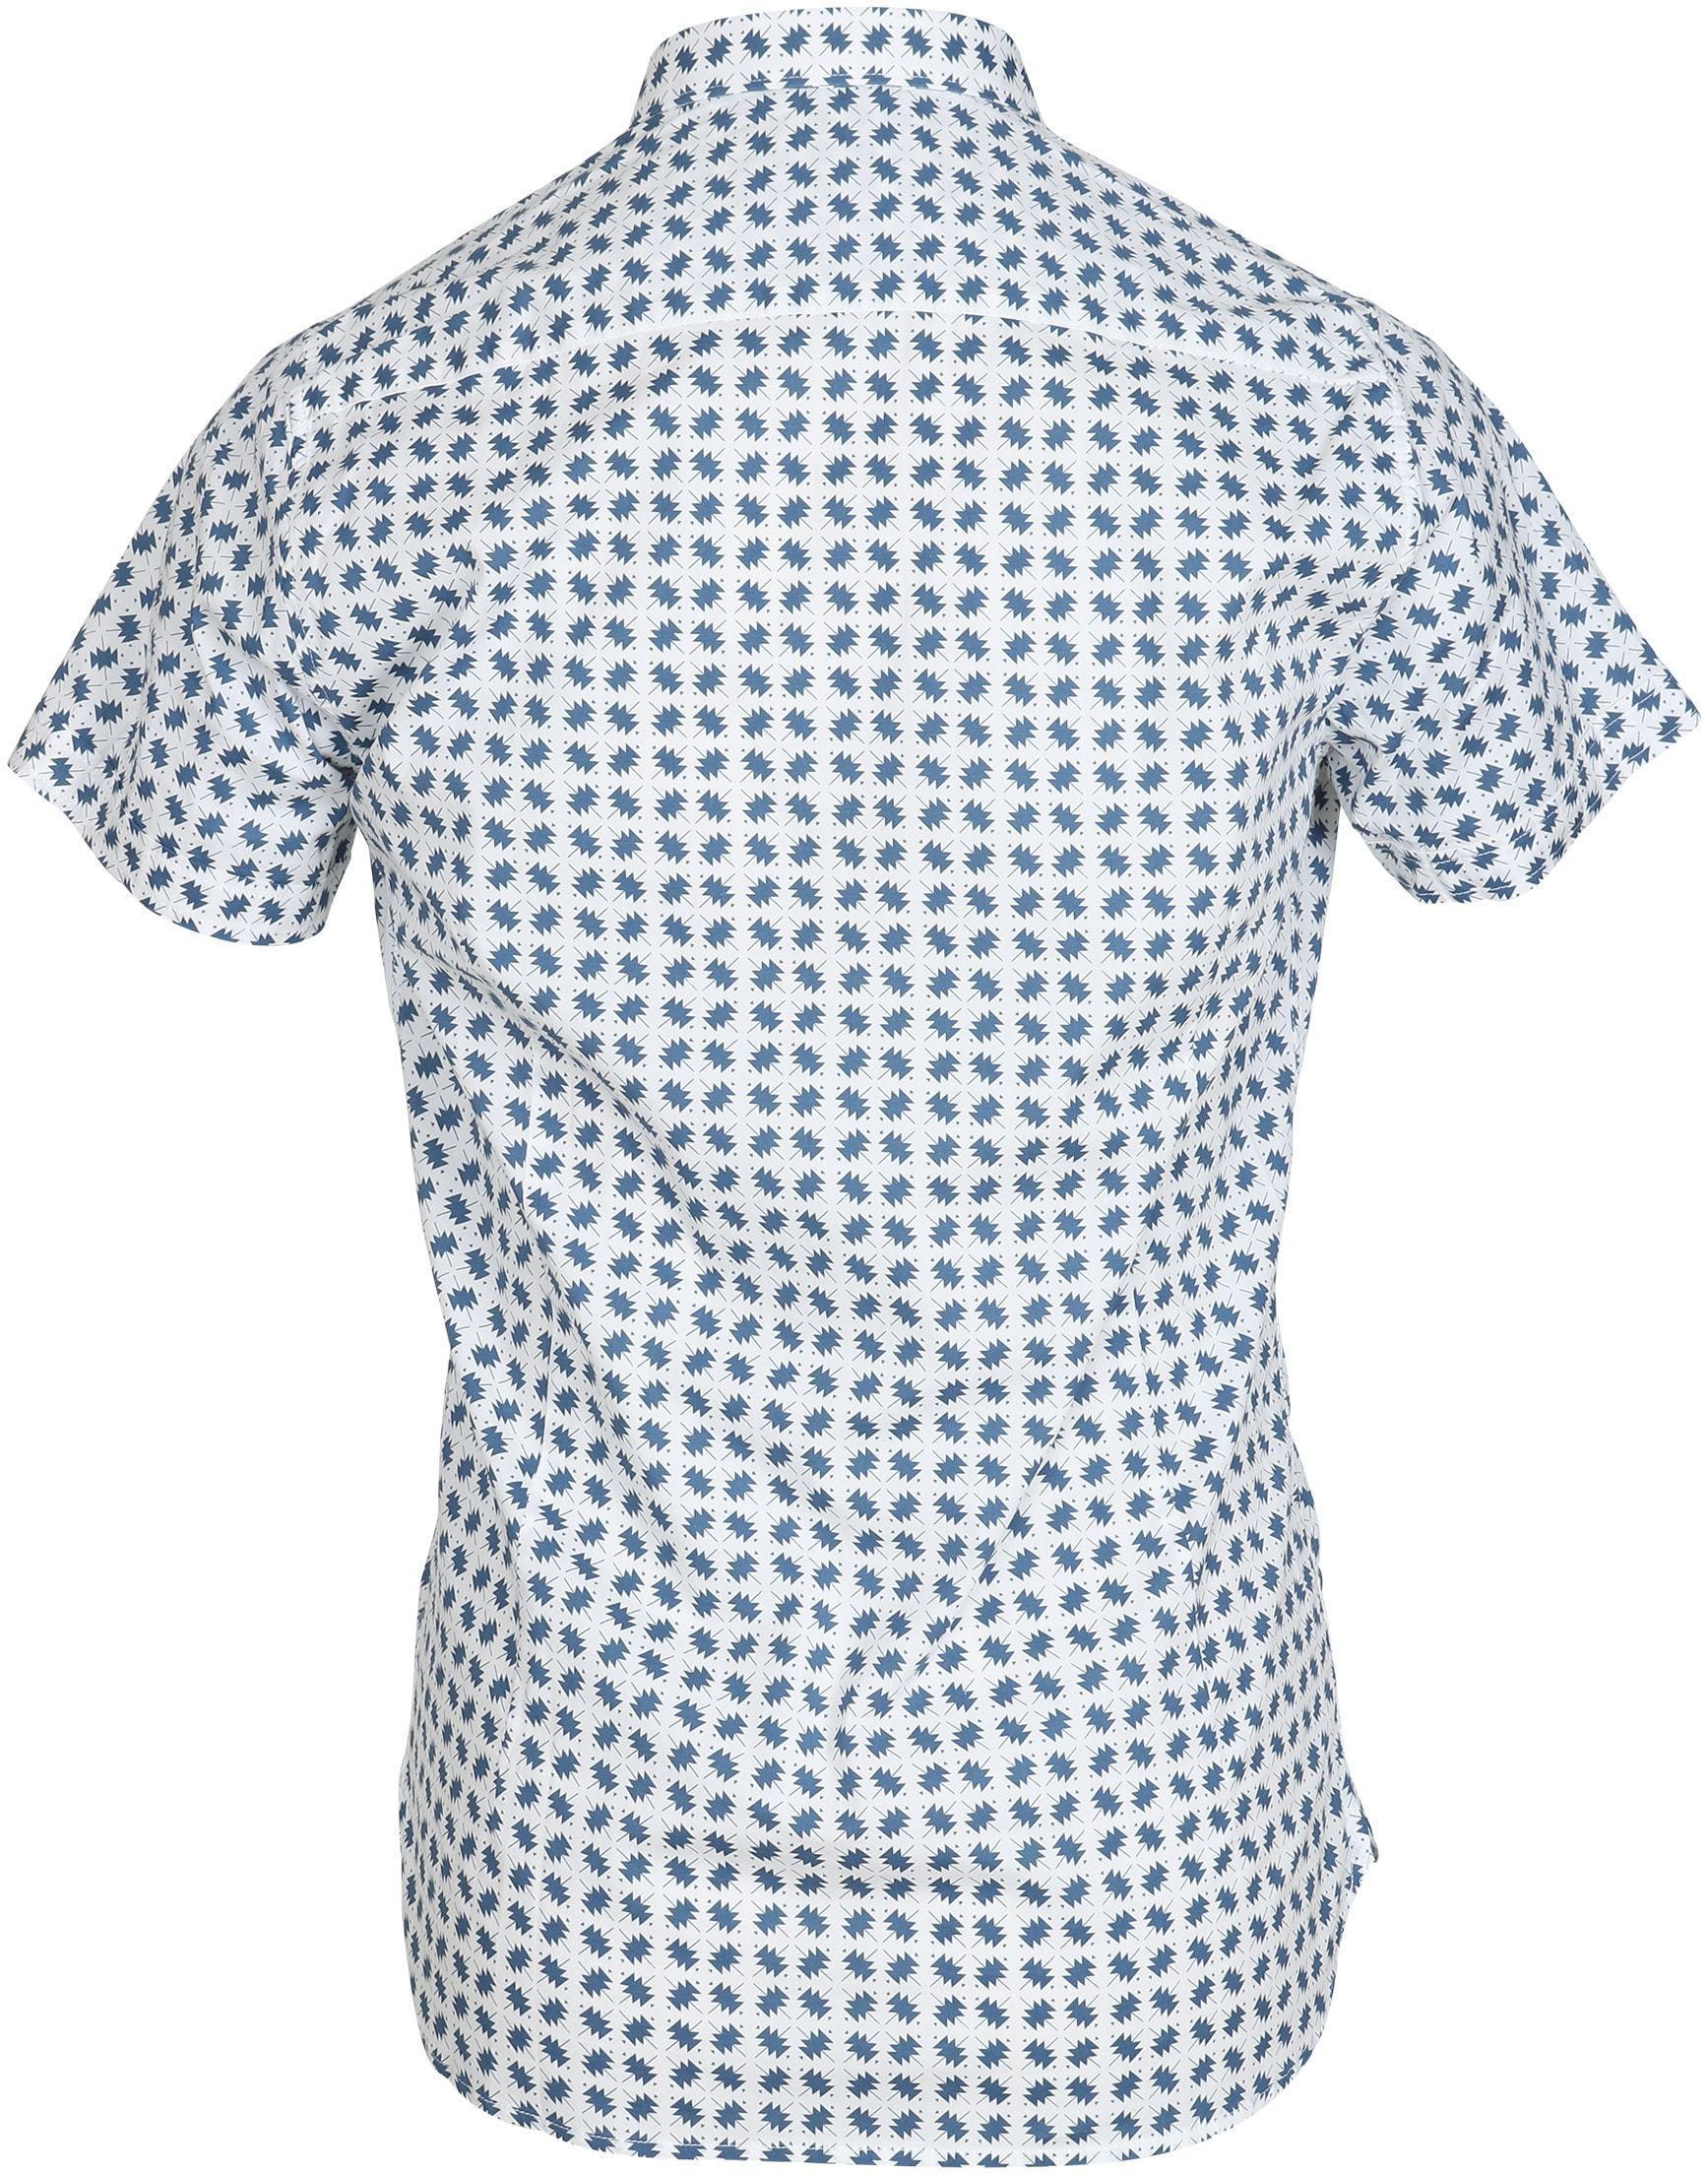 DStrezzed SS Overhemd Blauw Dessin foto 2